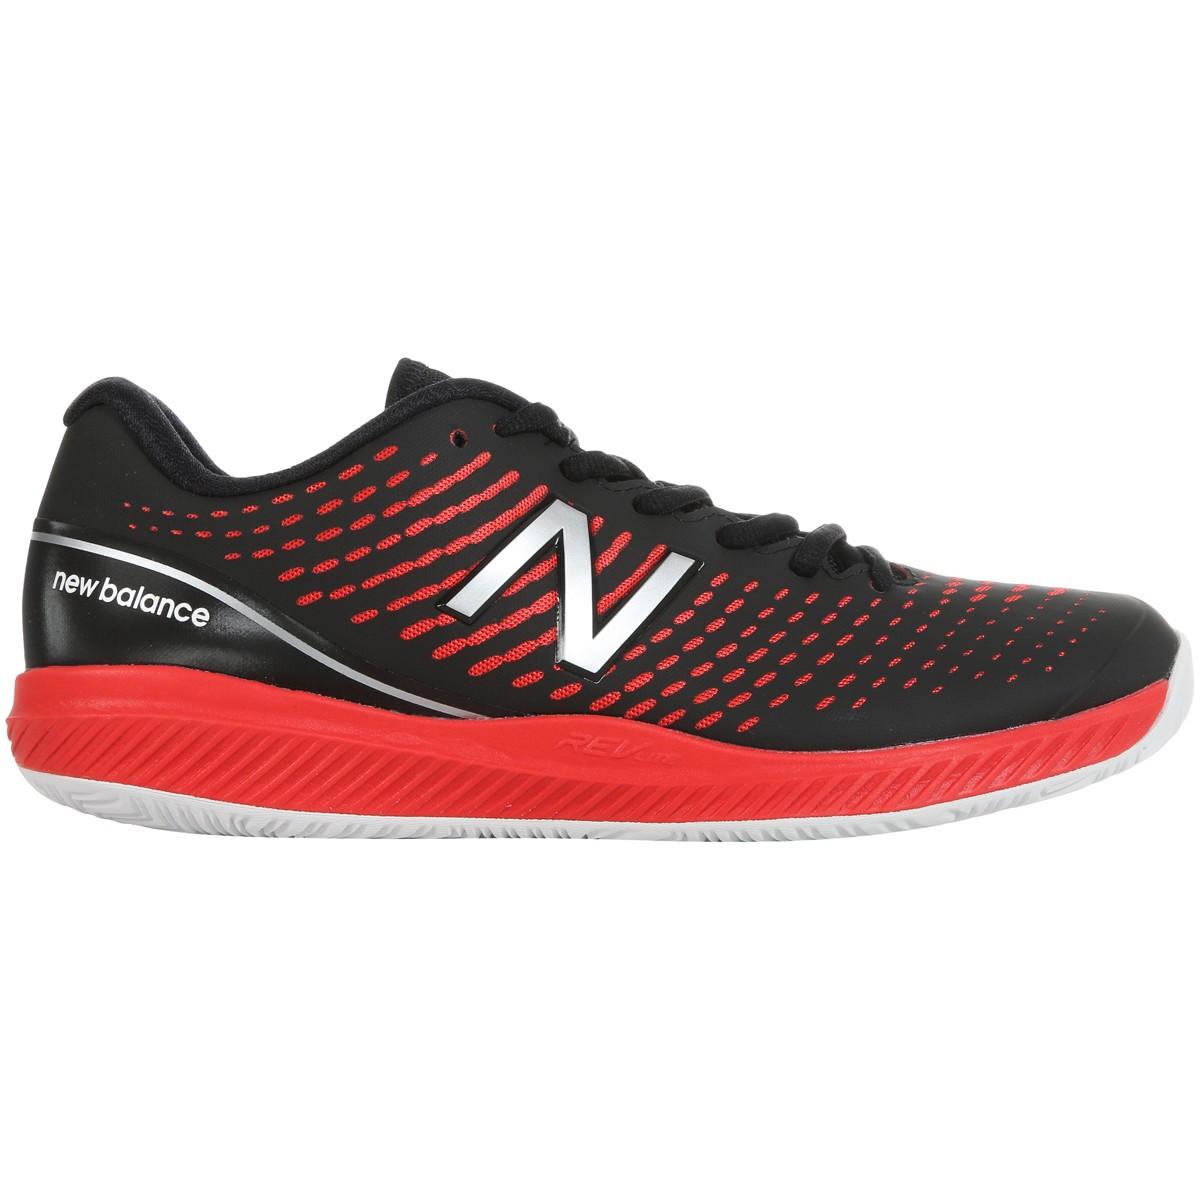 CHAUSSURES NEW BALANCE 796 V2 TOUTES SURFACES | Badminton-point.com